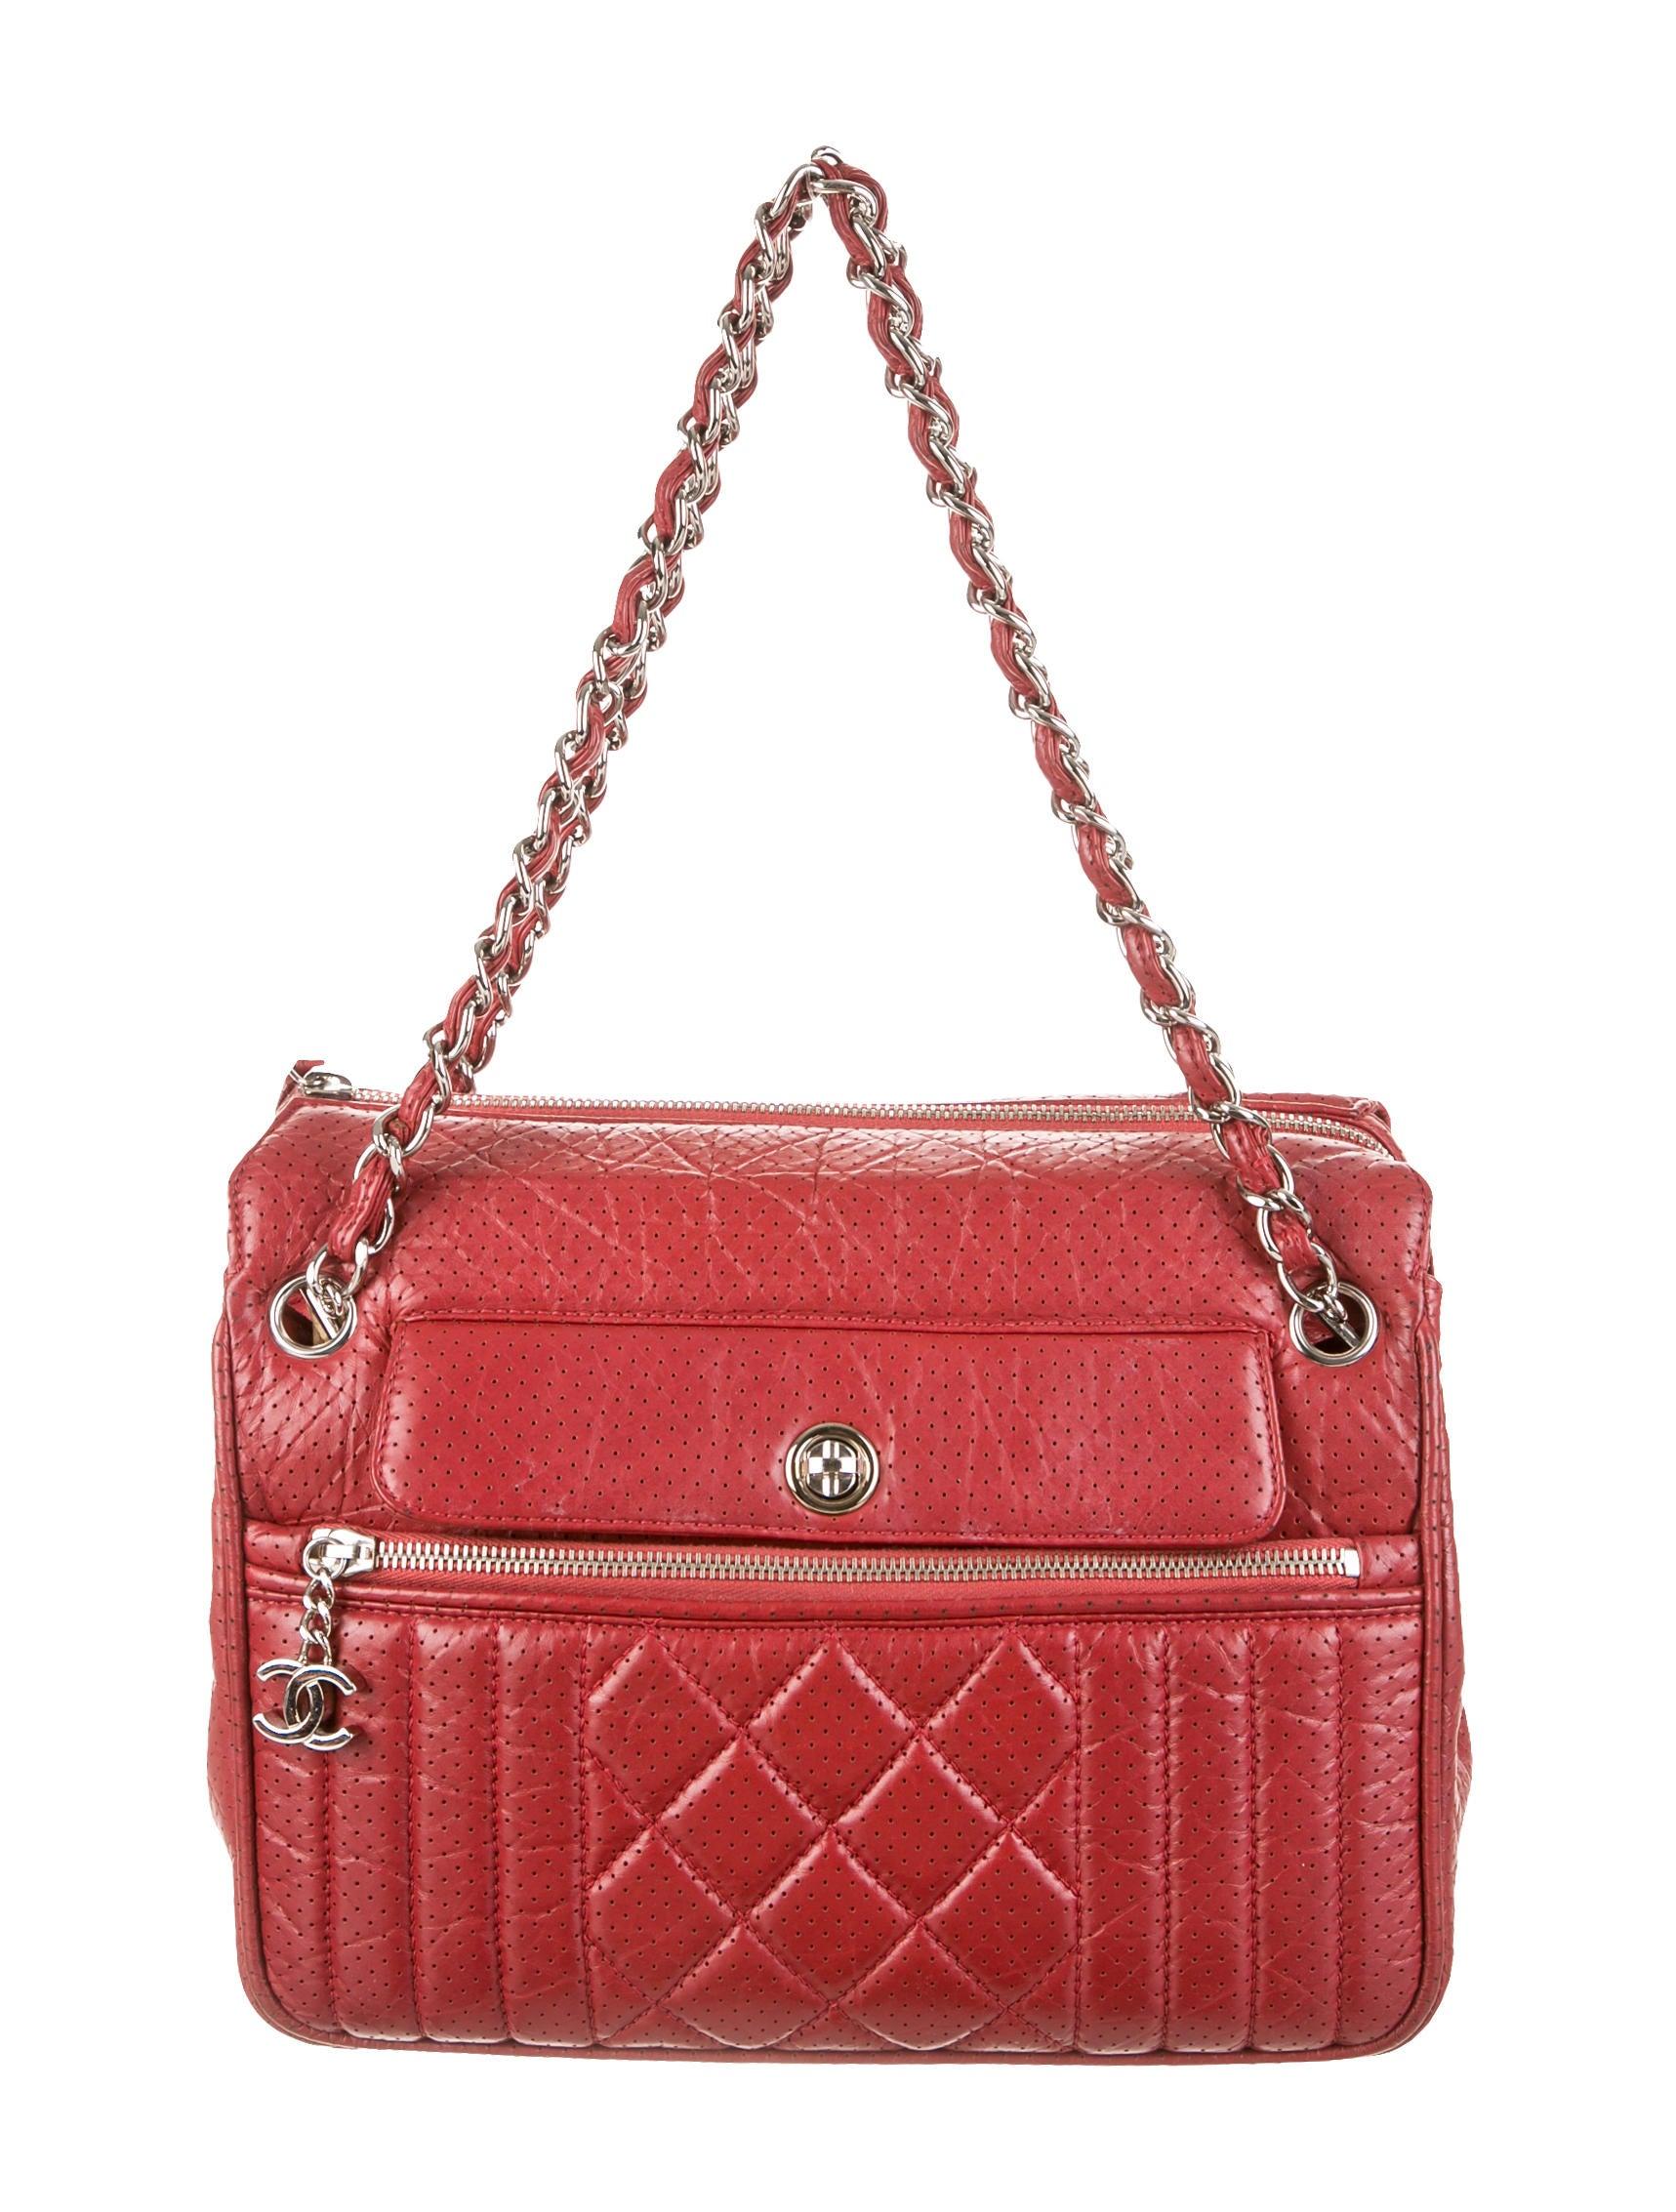 0b66820042f2 Chanel Perforated 50's Tote - Handbags - CHA69014 | The RealReal